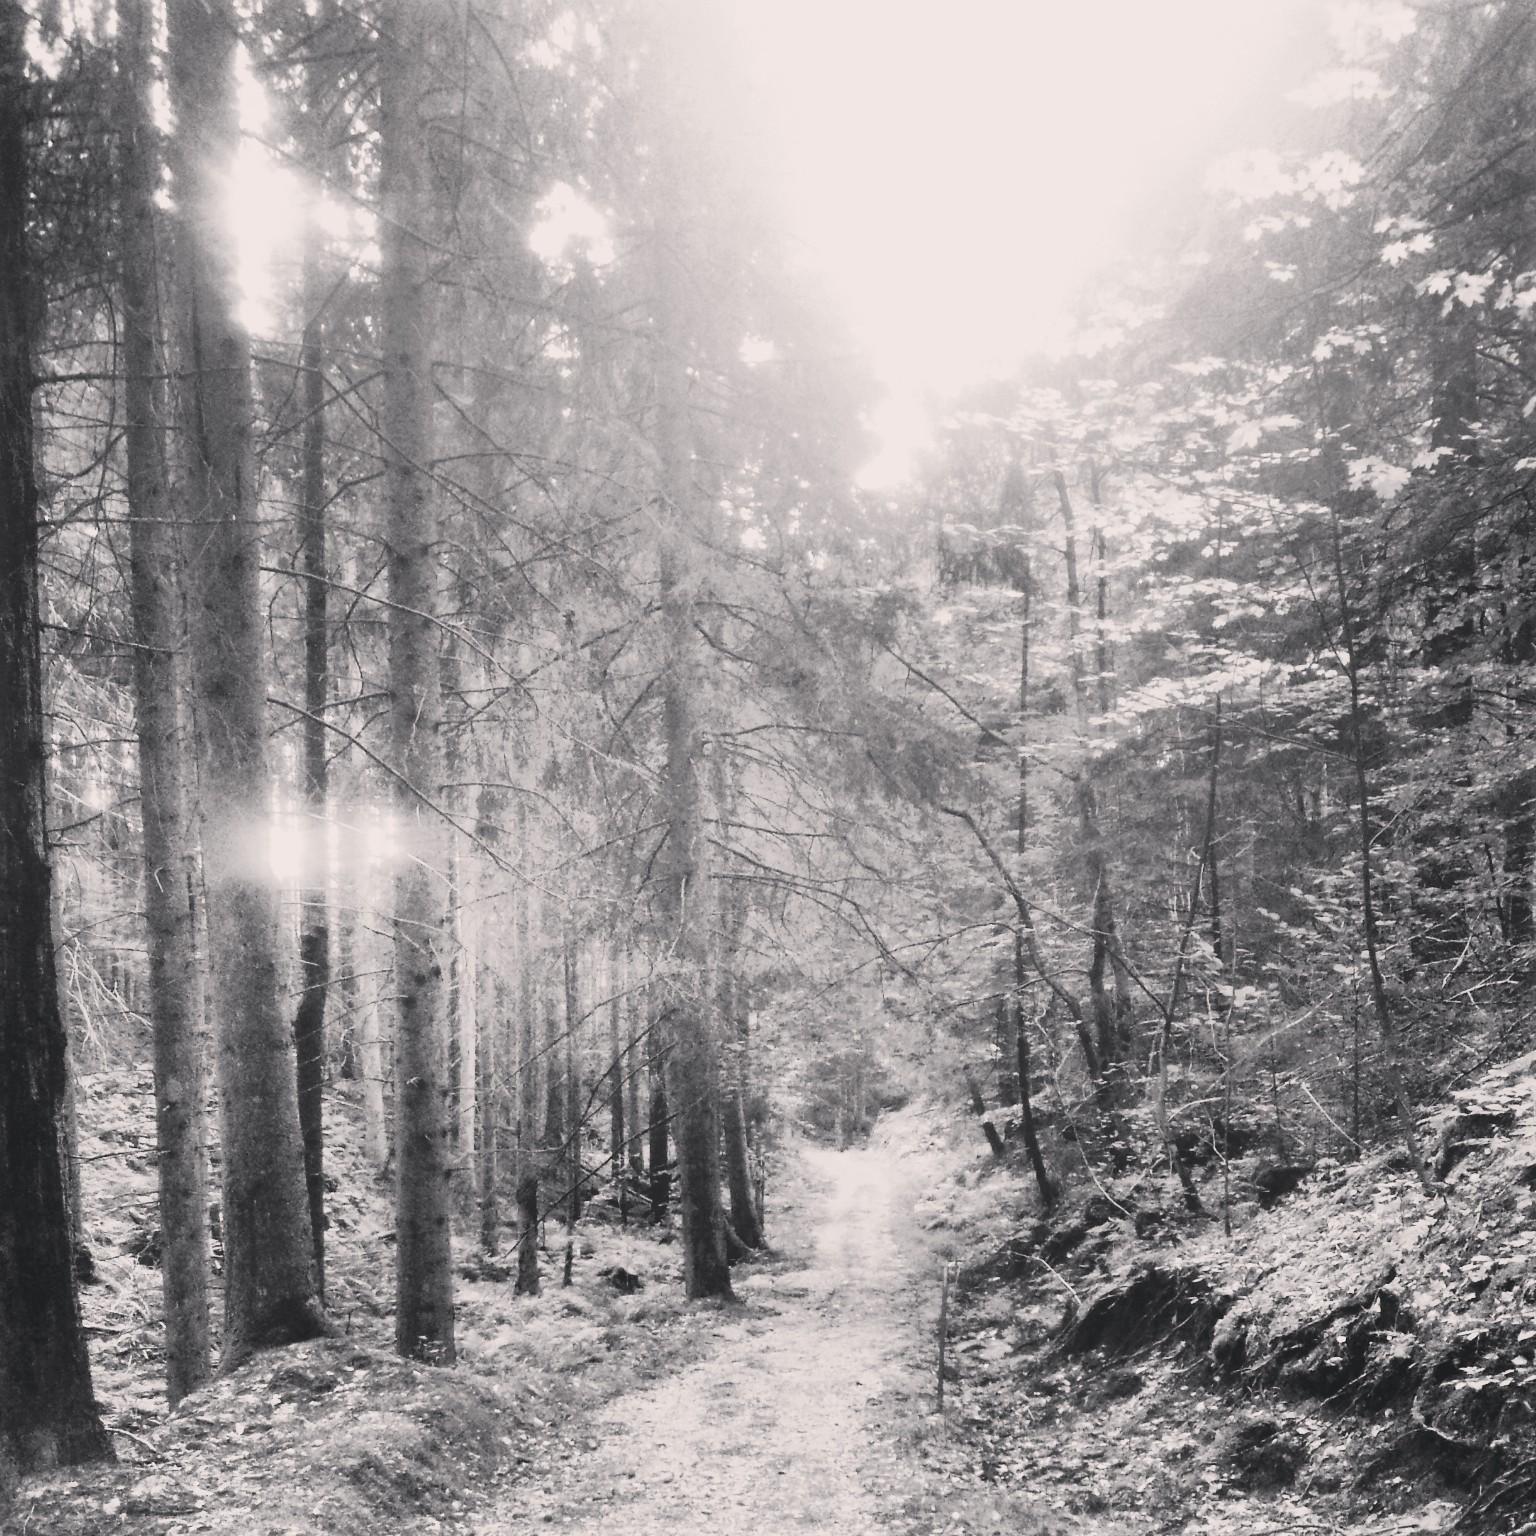 Svartvit bild på en vacker skog